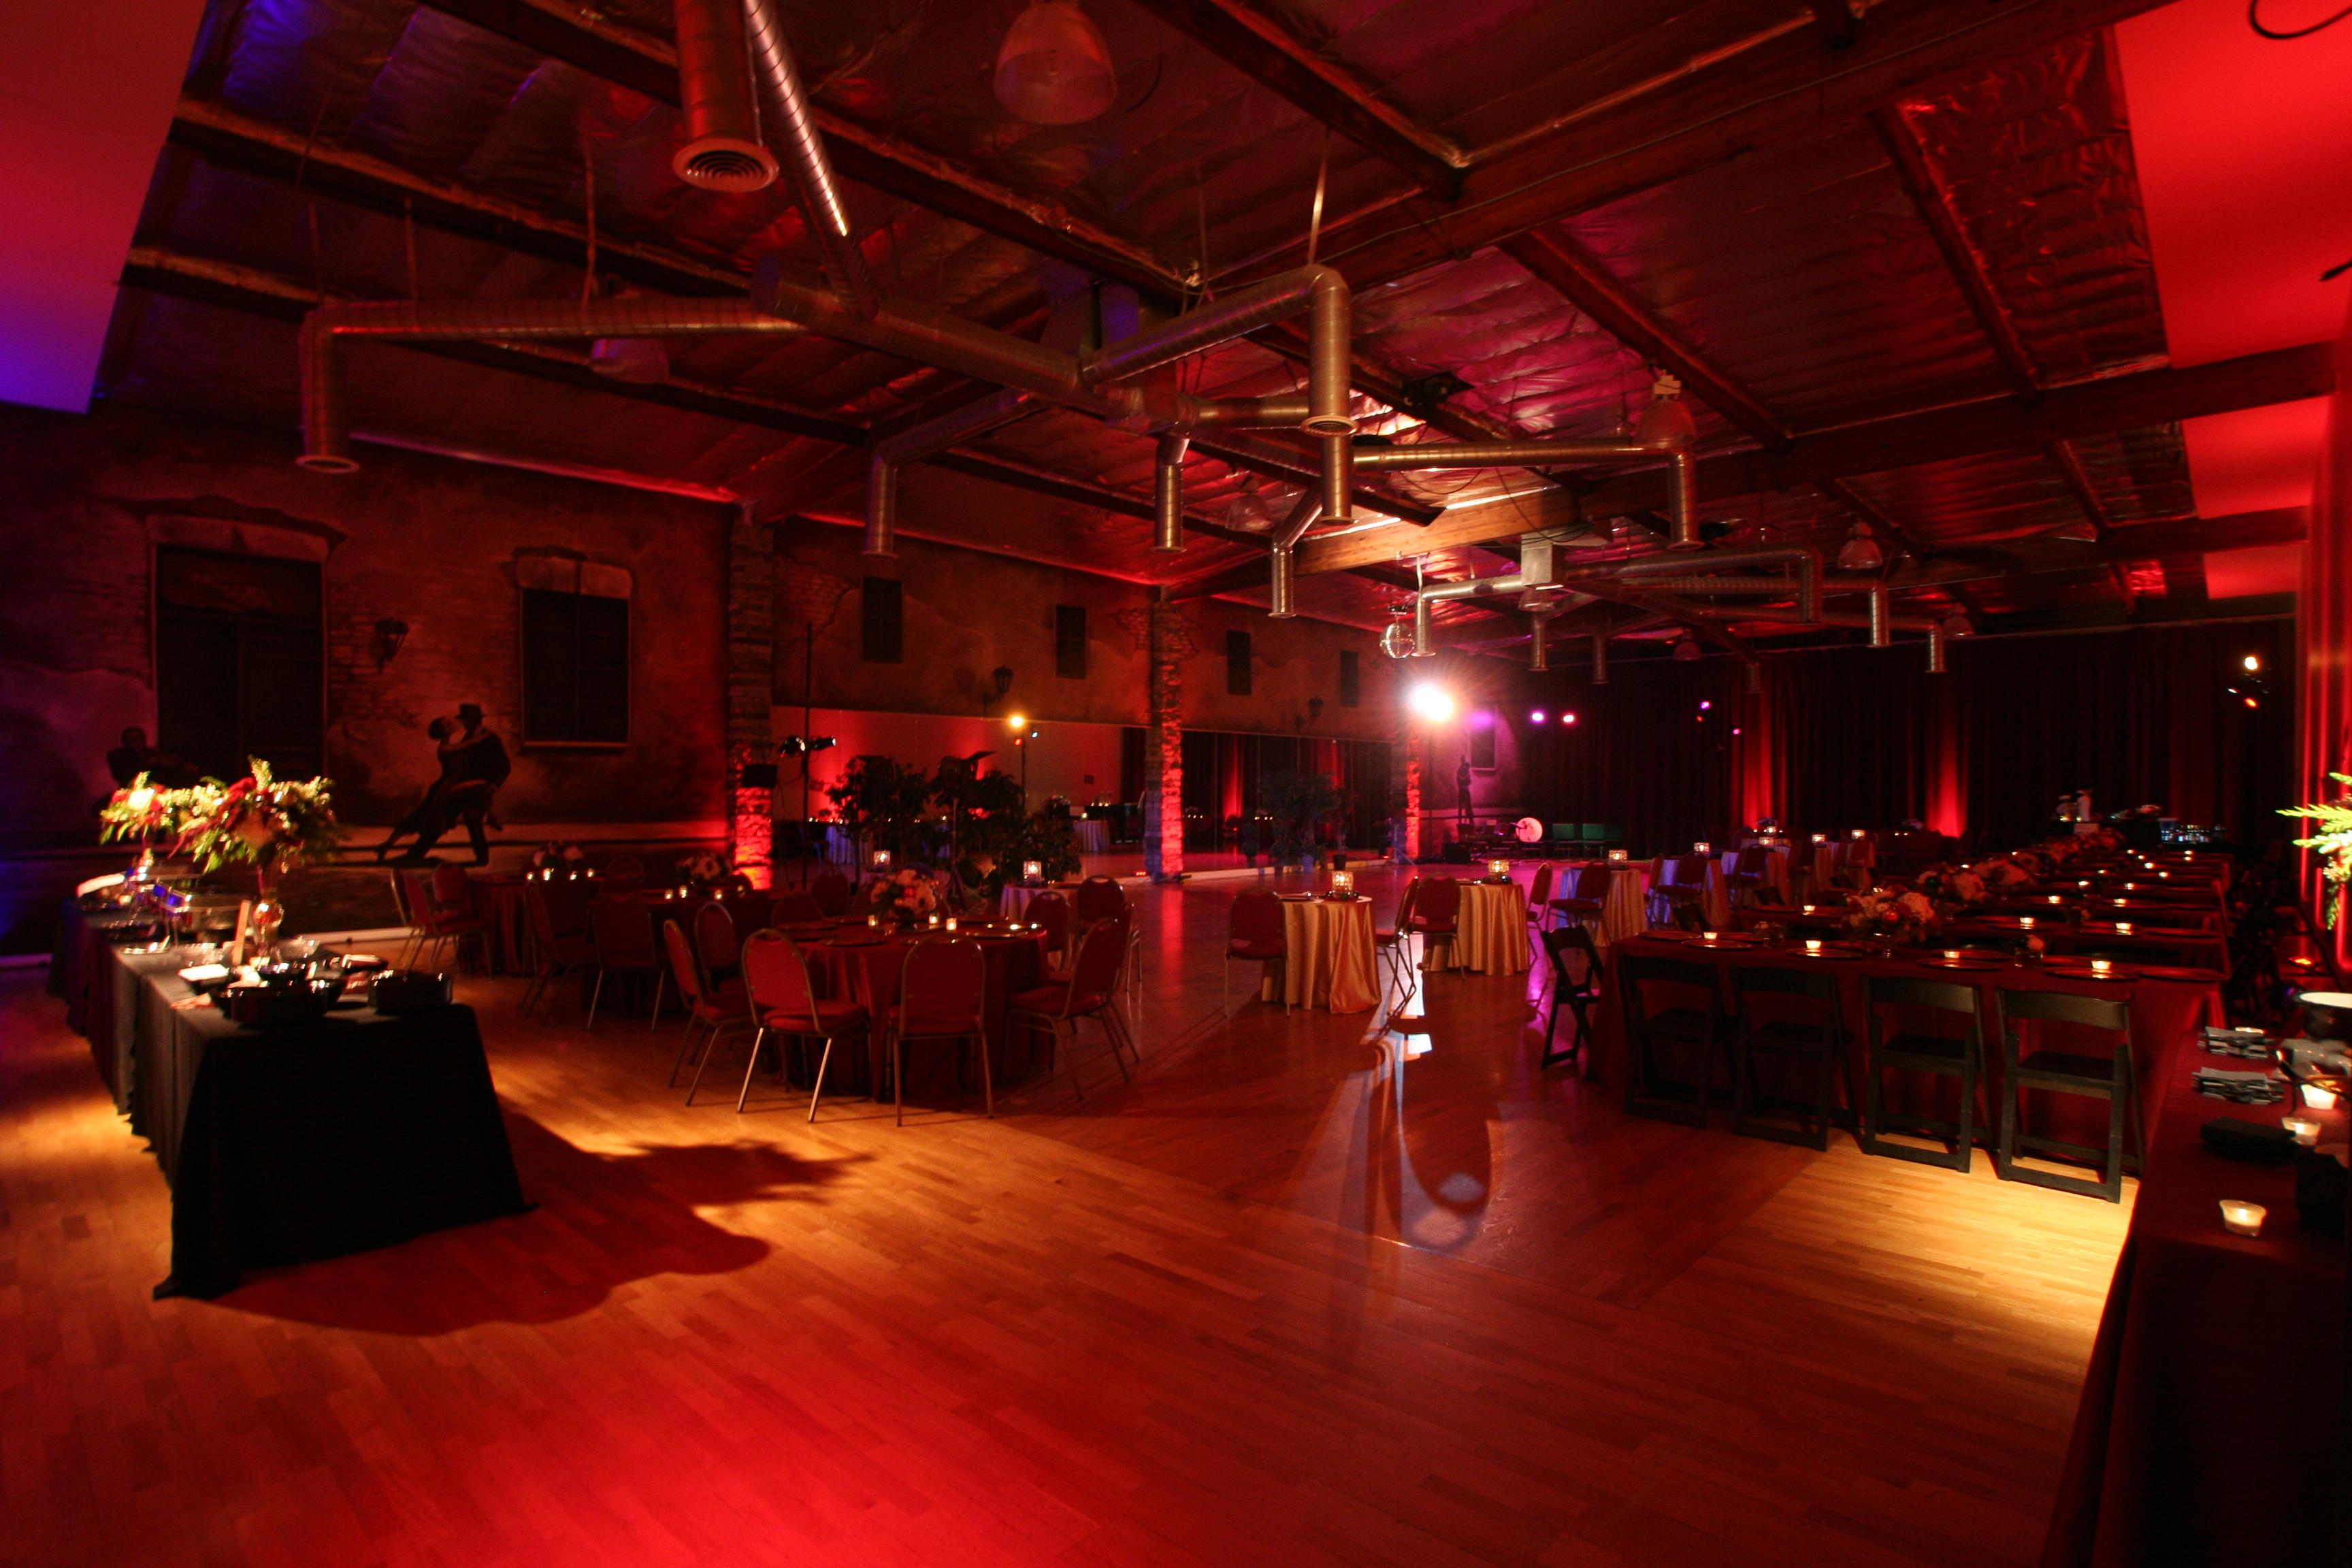 Spacious Ballroom Dance Hall Venue in the Heart of San Fernando